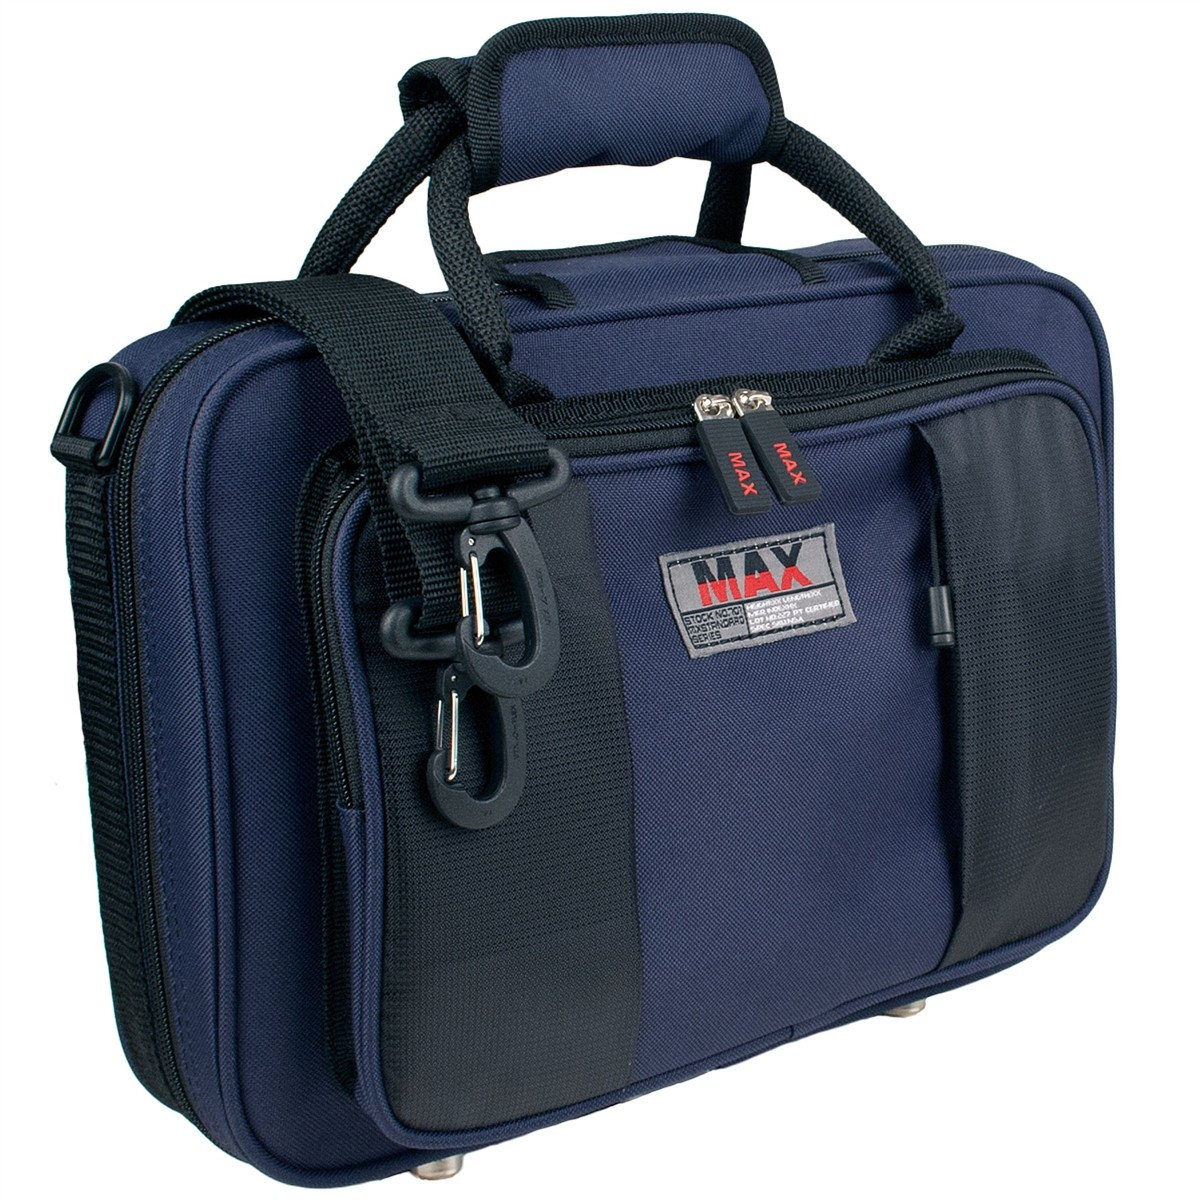 Protec Bb Clarinet MAX Case (Blue MX307BX)